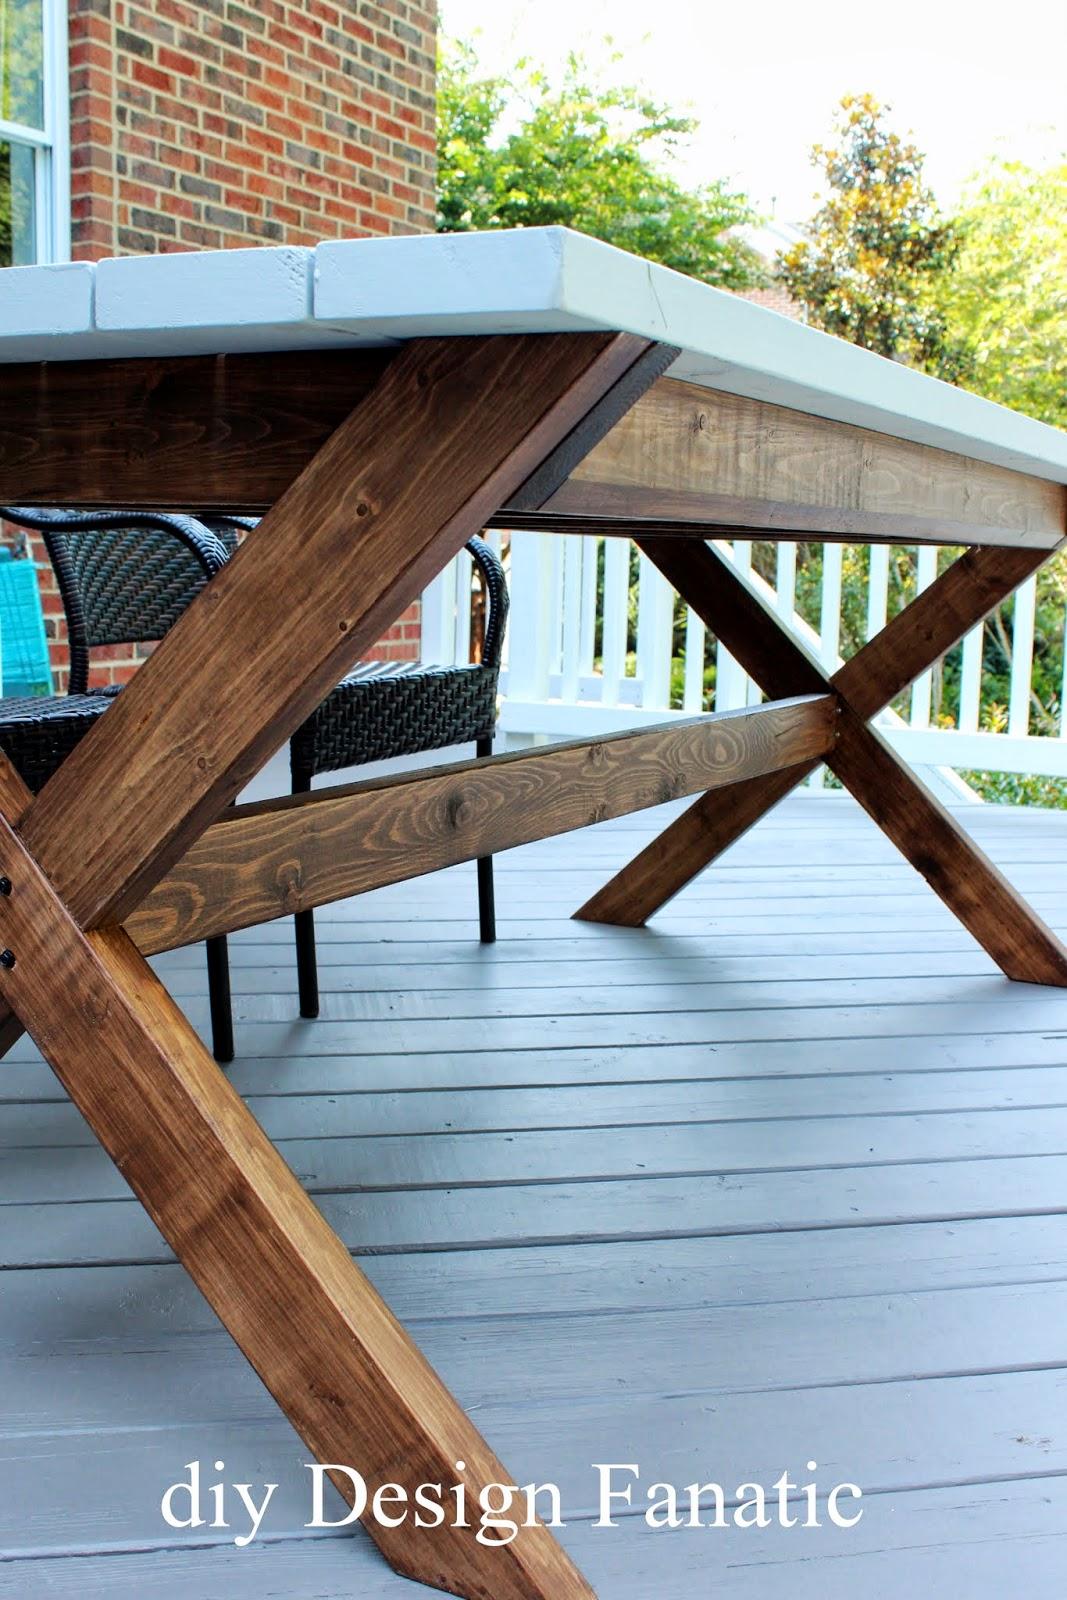 Diy Design Fanatic Pottery Barn Inspired Picnic Table - Pottery barn picnic table